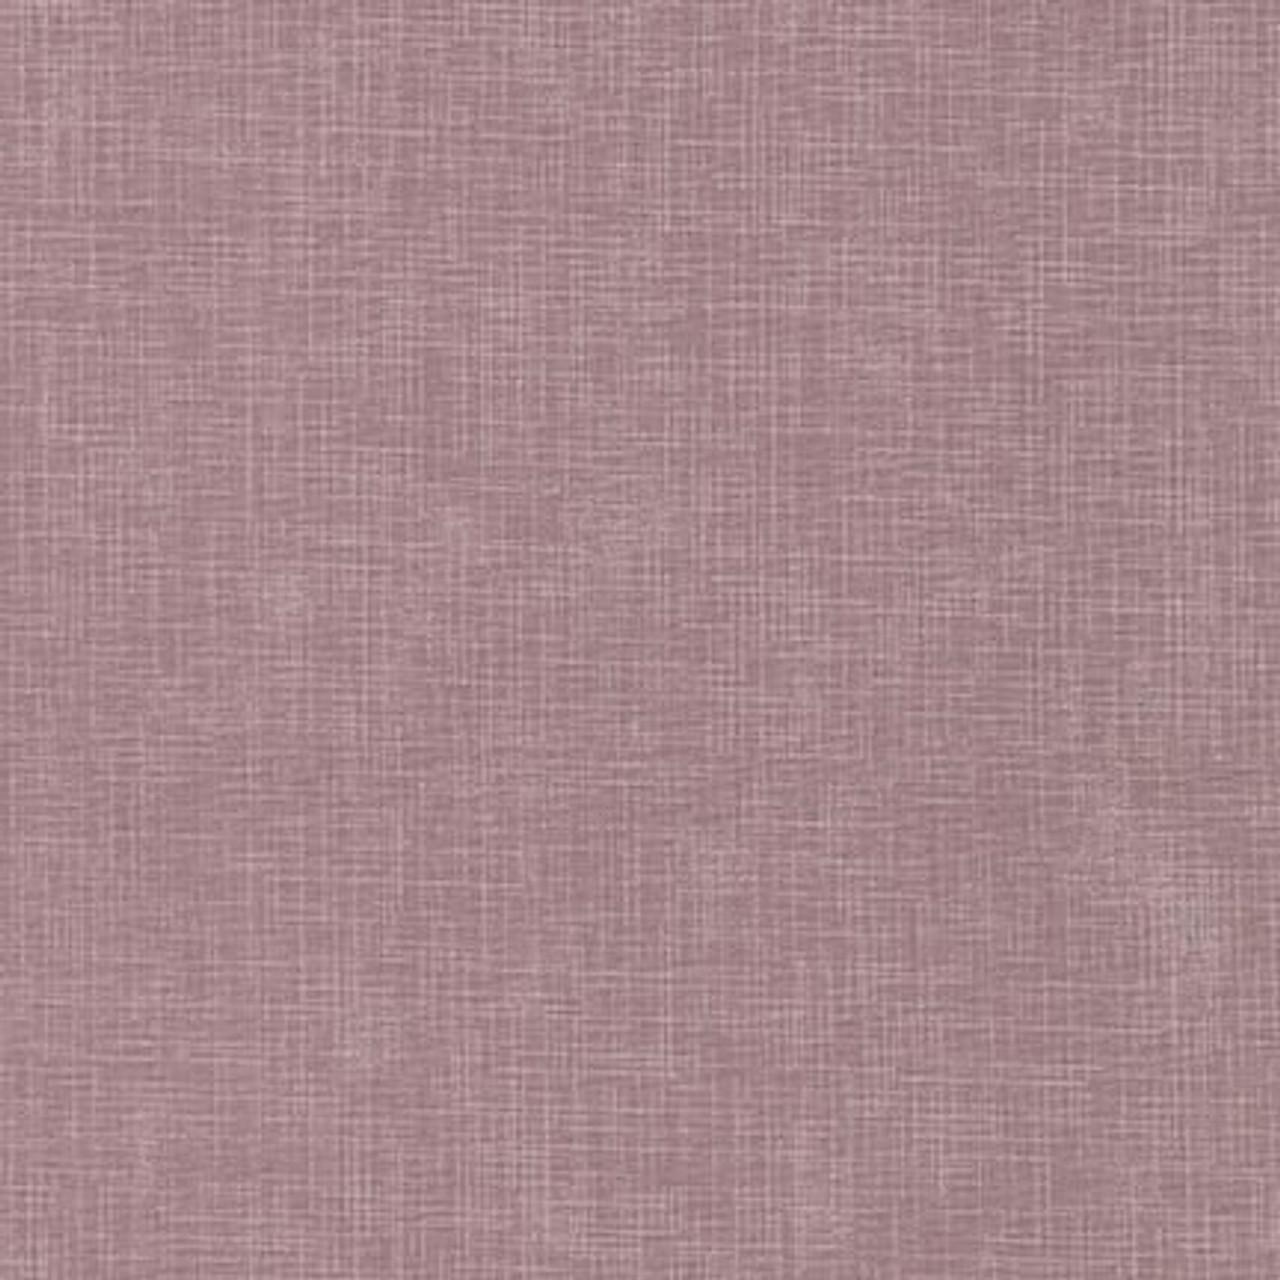 100% Cotton linen look - Orchid